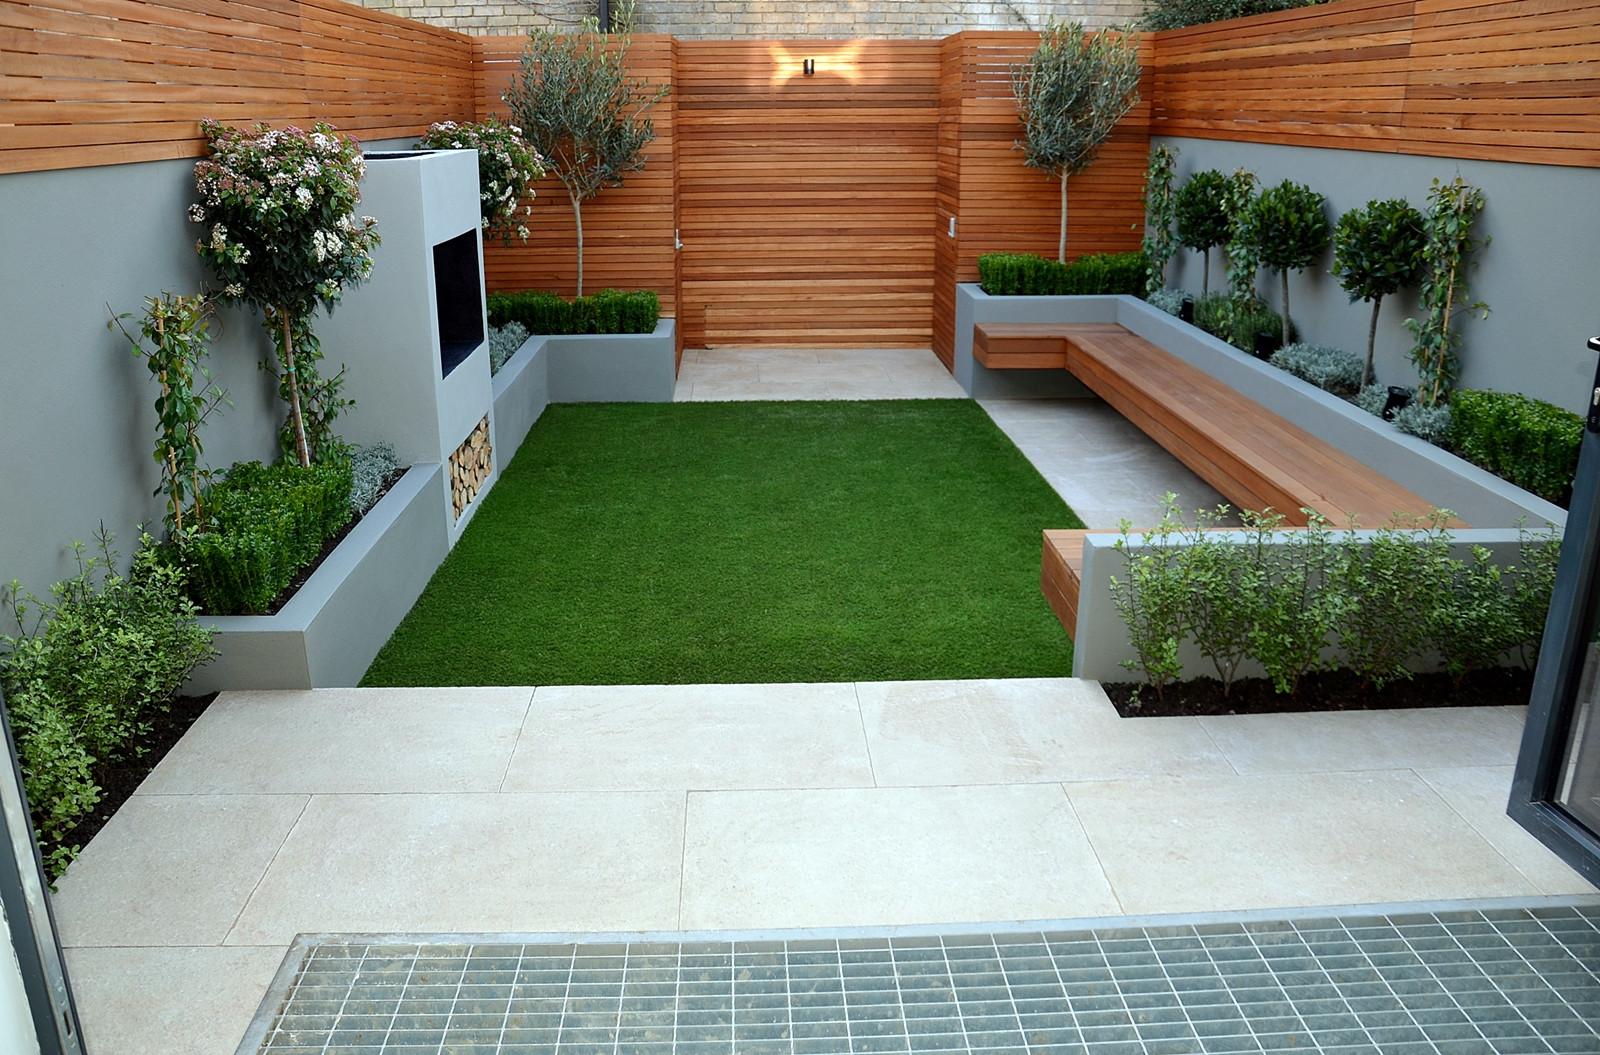 Best ideas about Modern Backyard Ideas . Save or Pin contemporary modern small garden designer anewgarden Now.